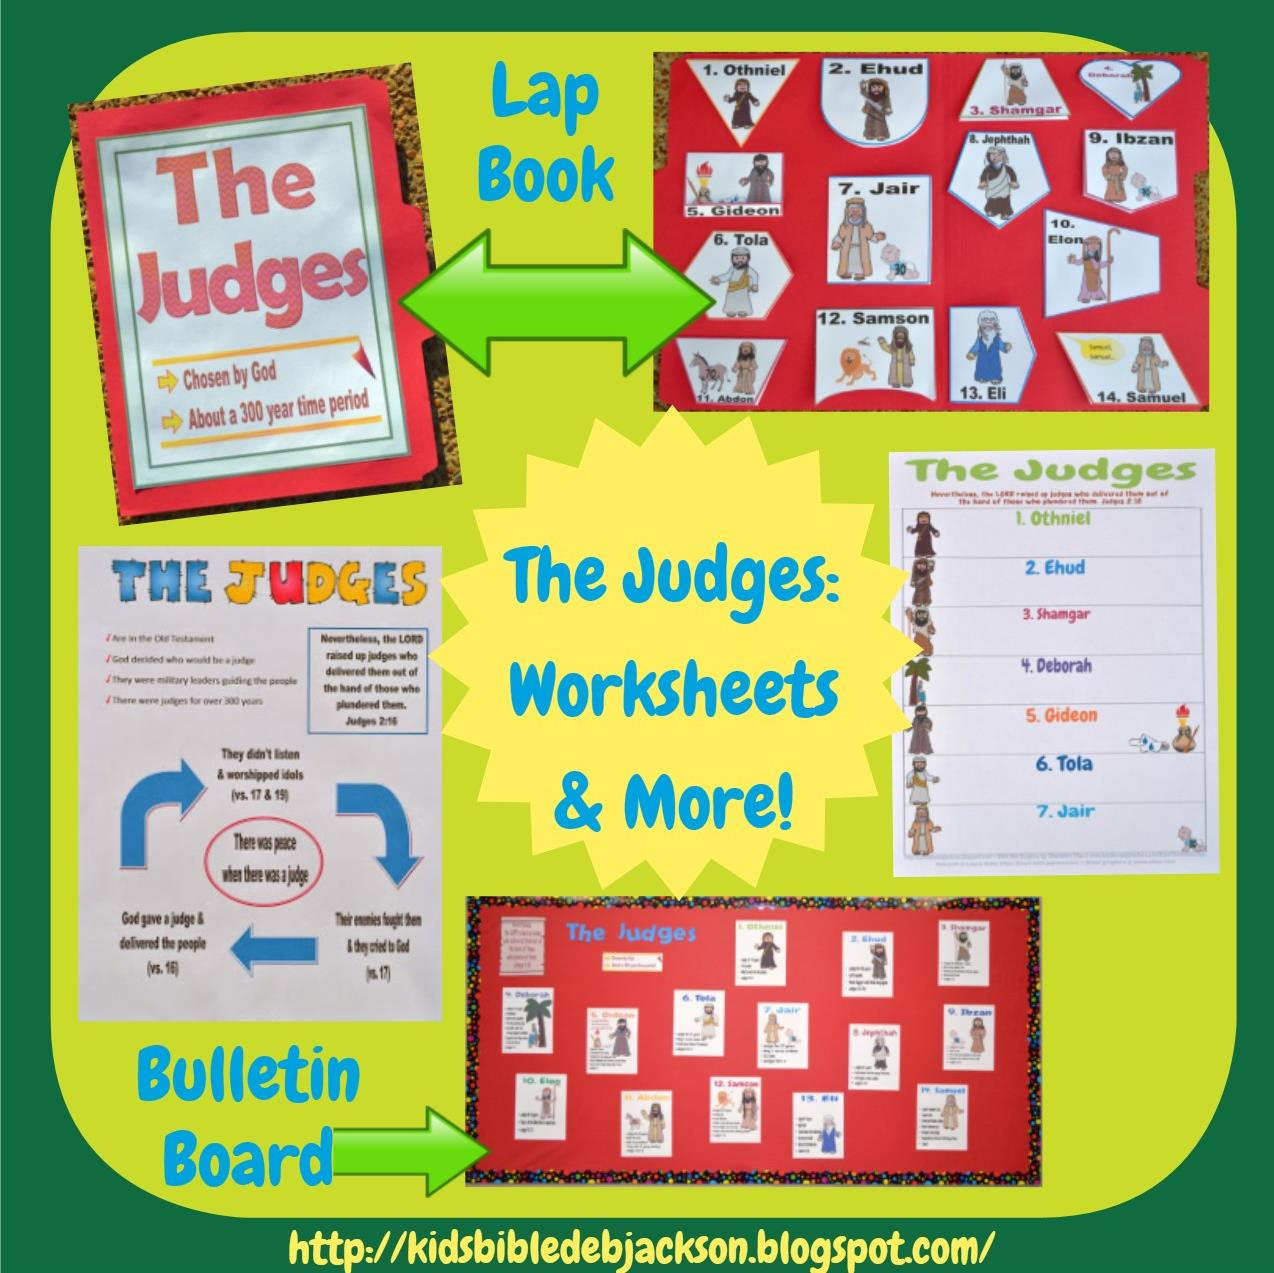 http://kidsbibledebjackson.blogspot.com/2013/11/the-judges.html